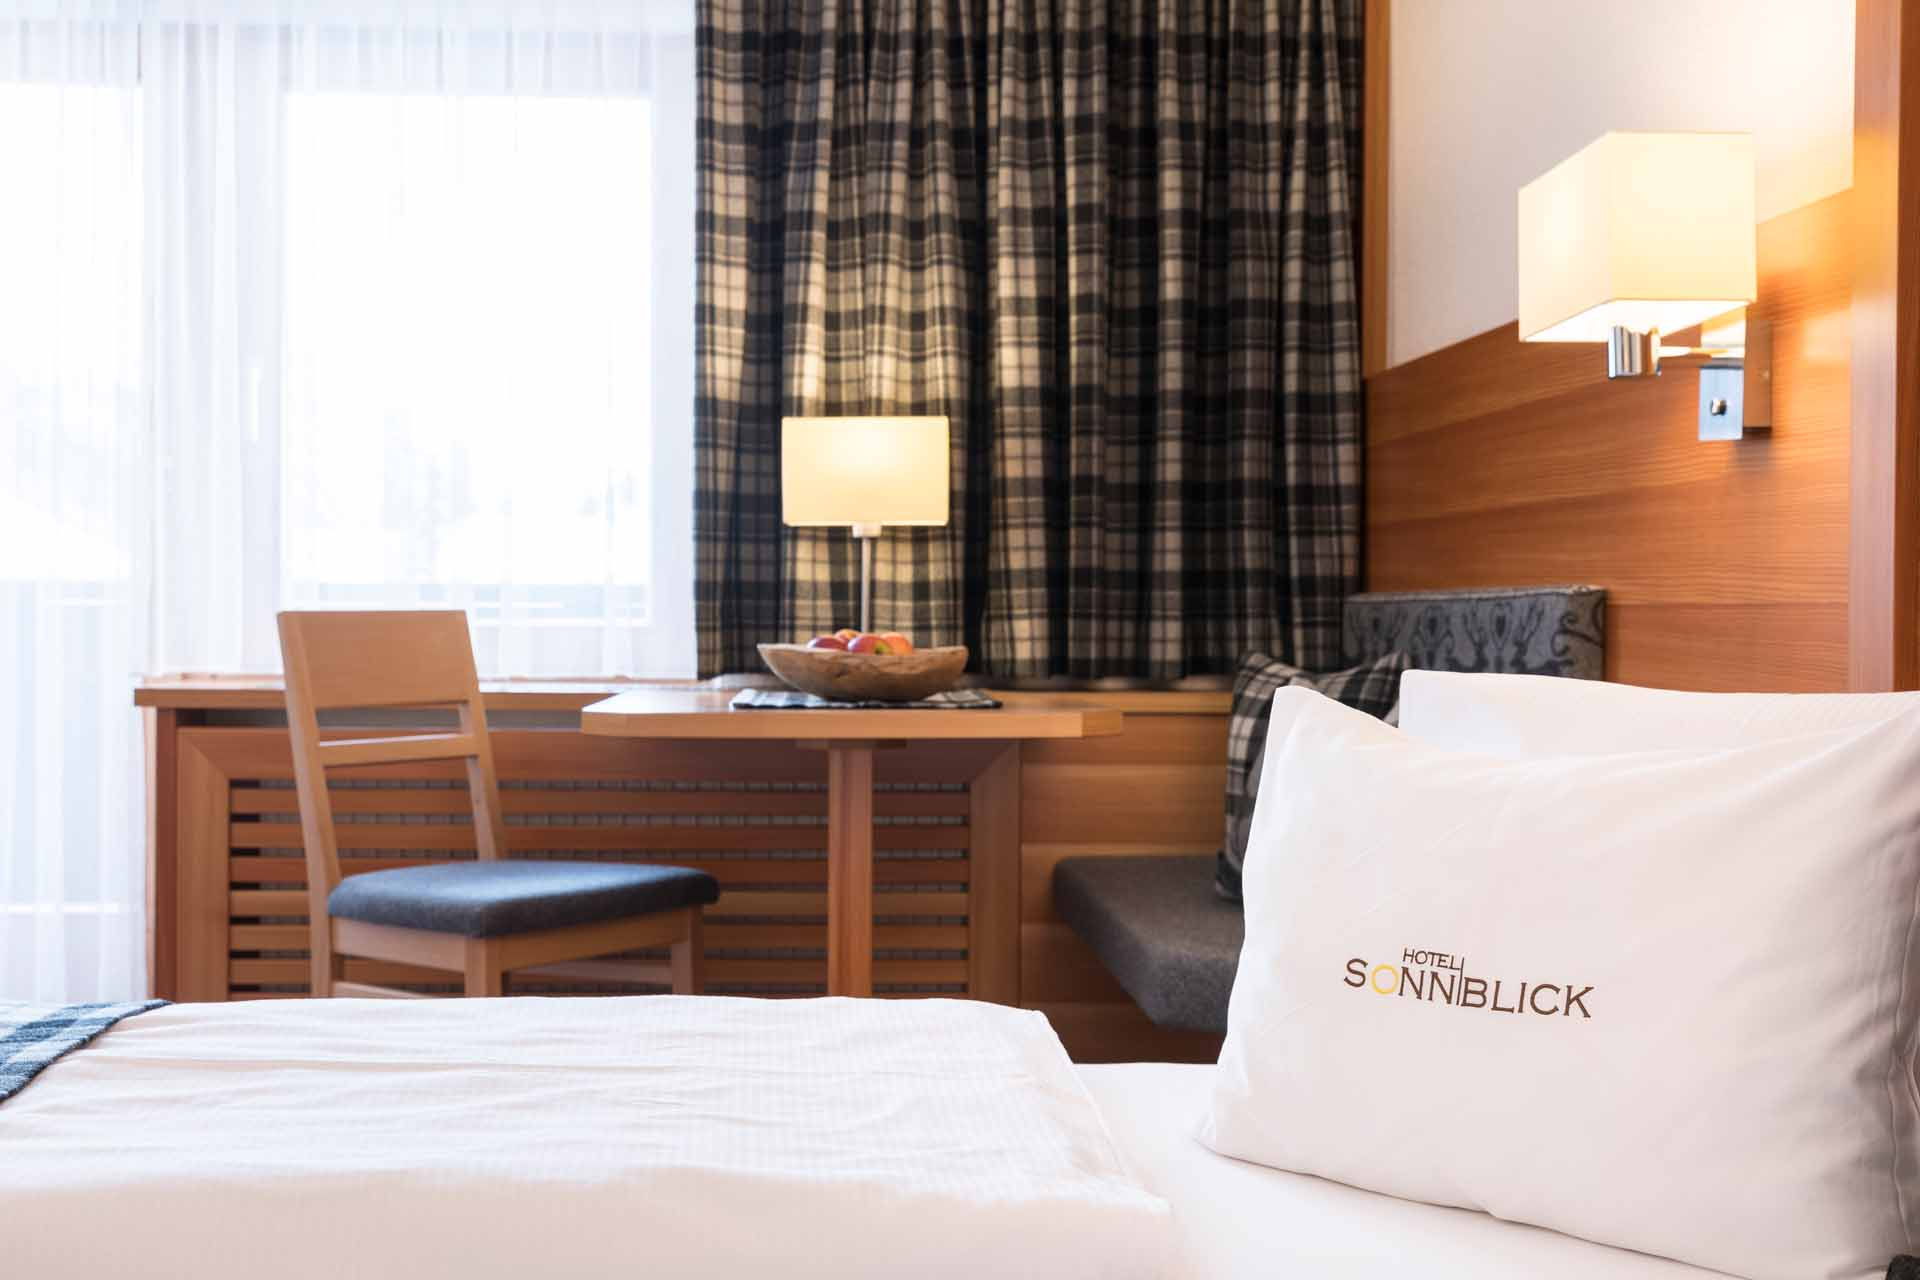 Hotel Sonnblick Tyrol (11)